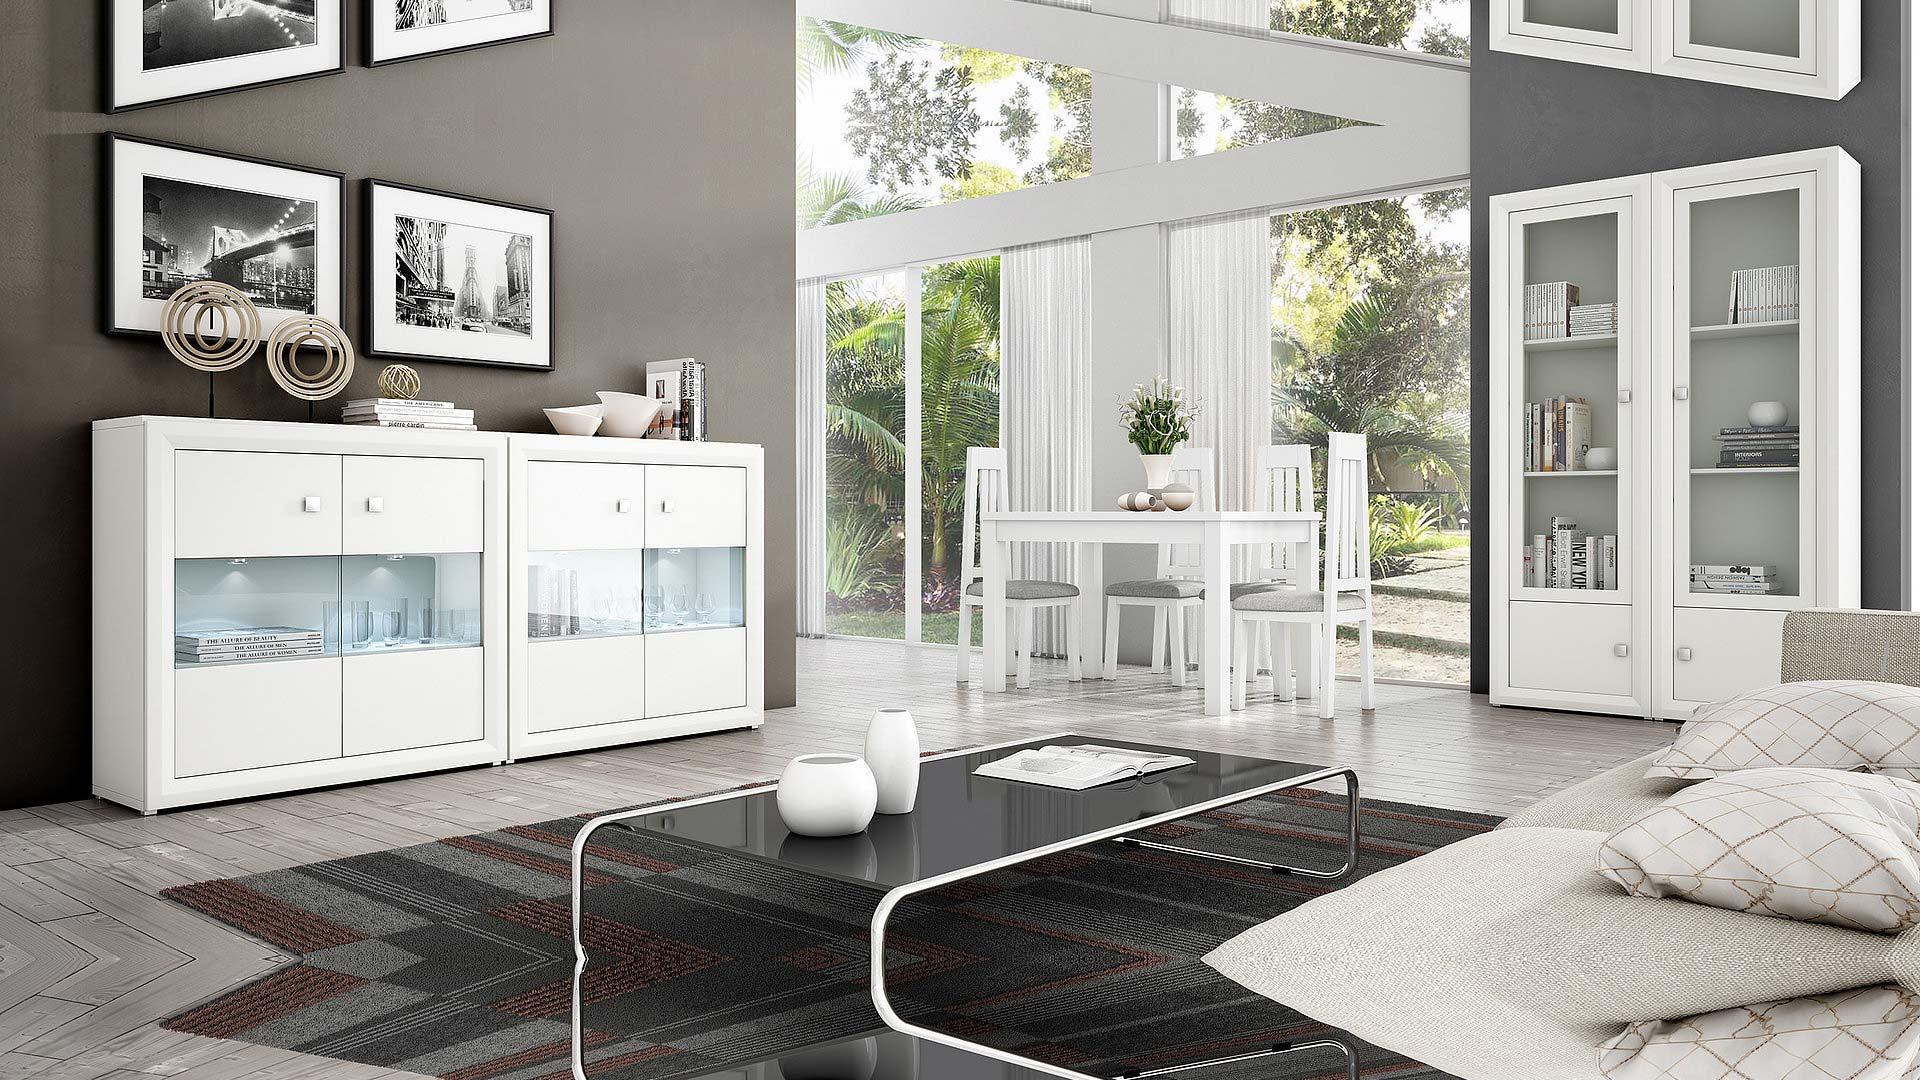 Muebles serie económica